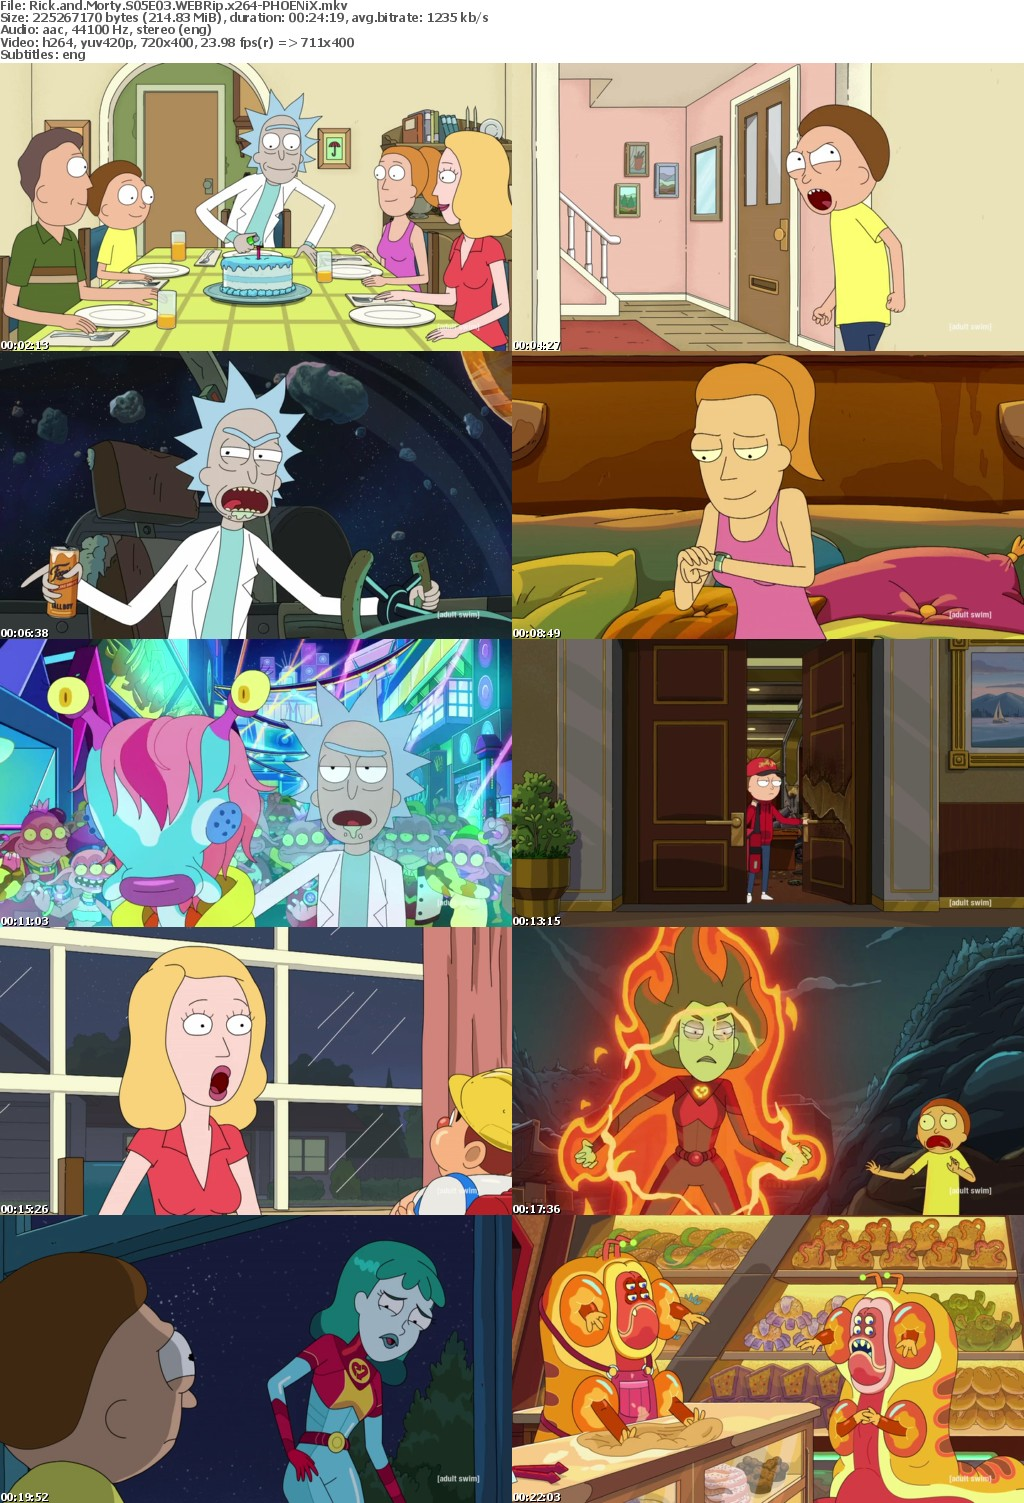 Rick and Morty S05E03 WEBRip x264-PHOENiX